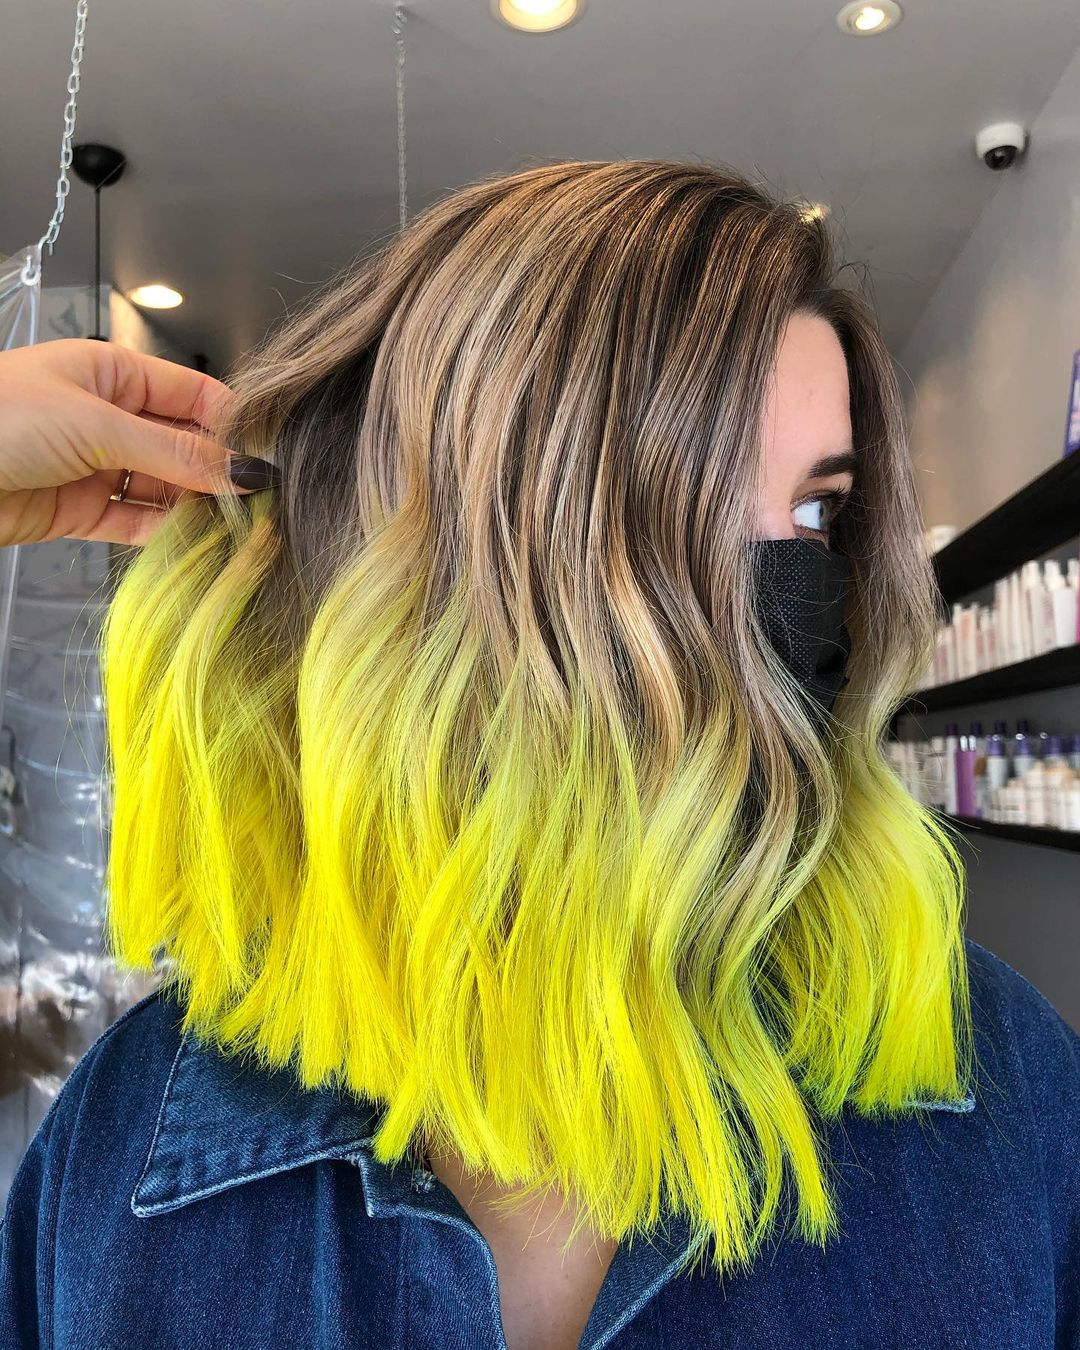 Stylish Shoulder Length Haircut and Color 2021   Fun ...